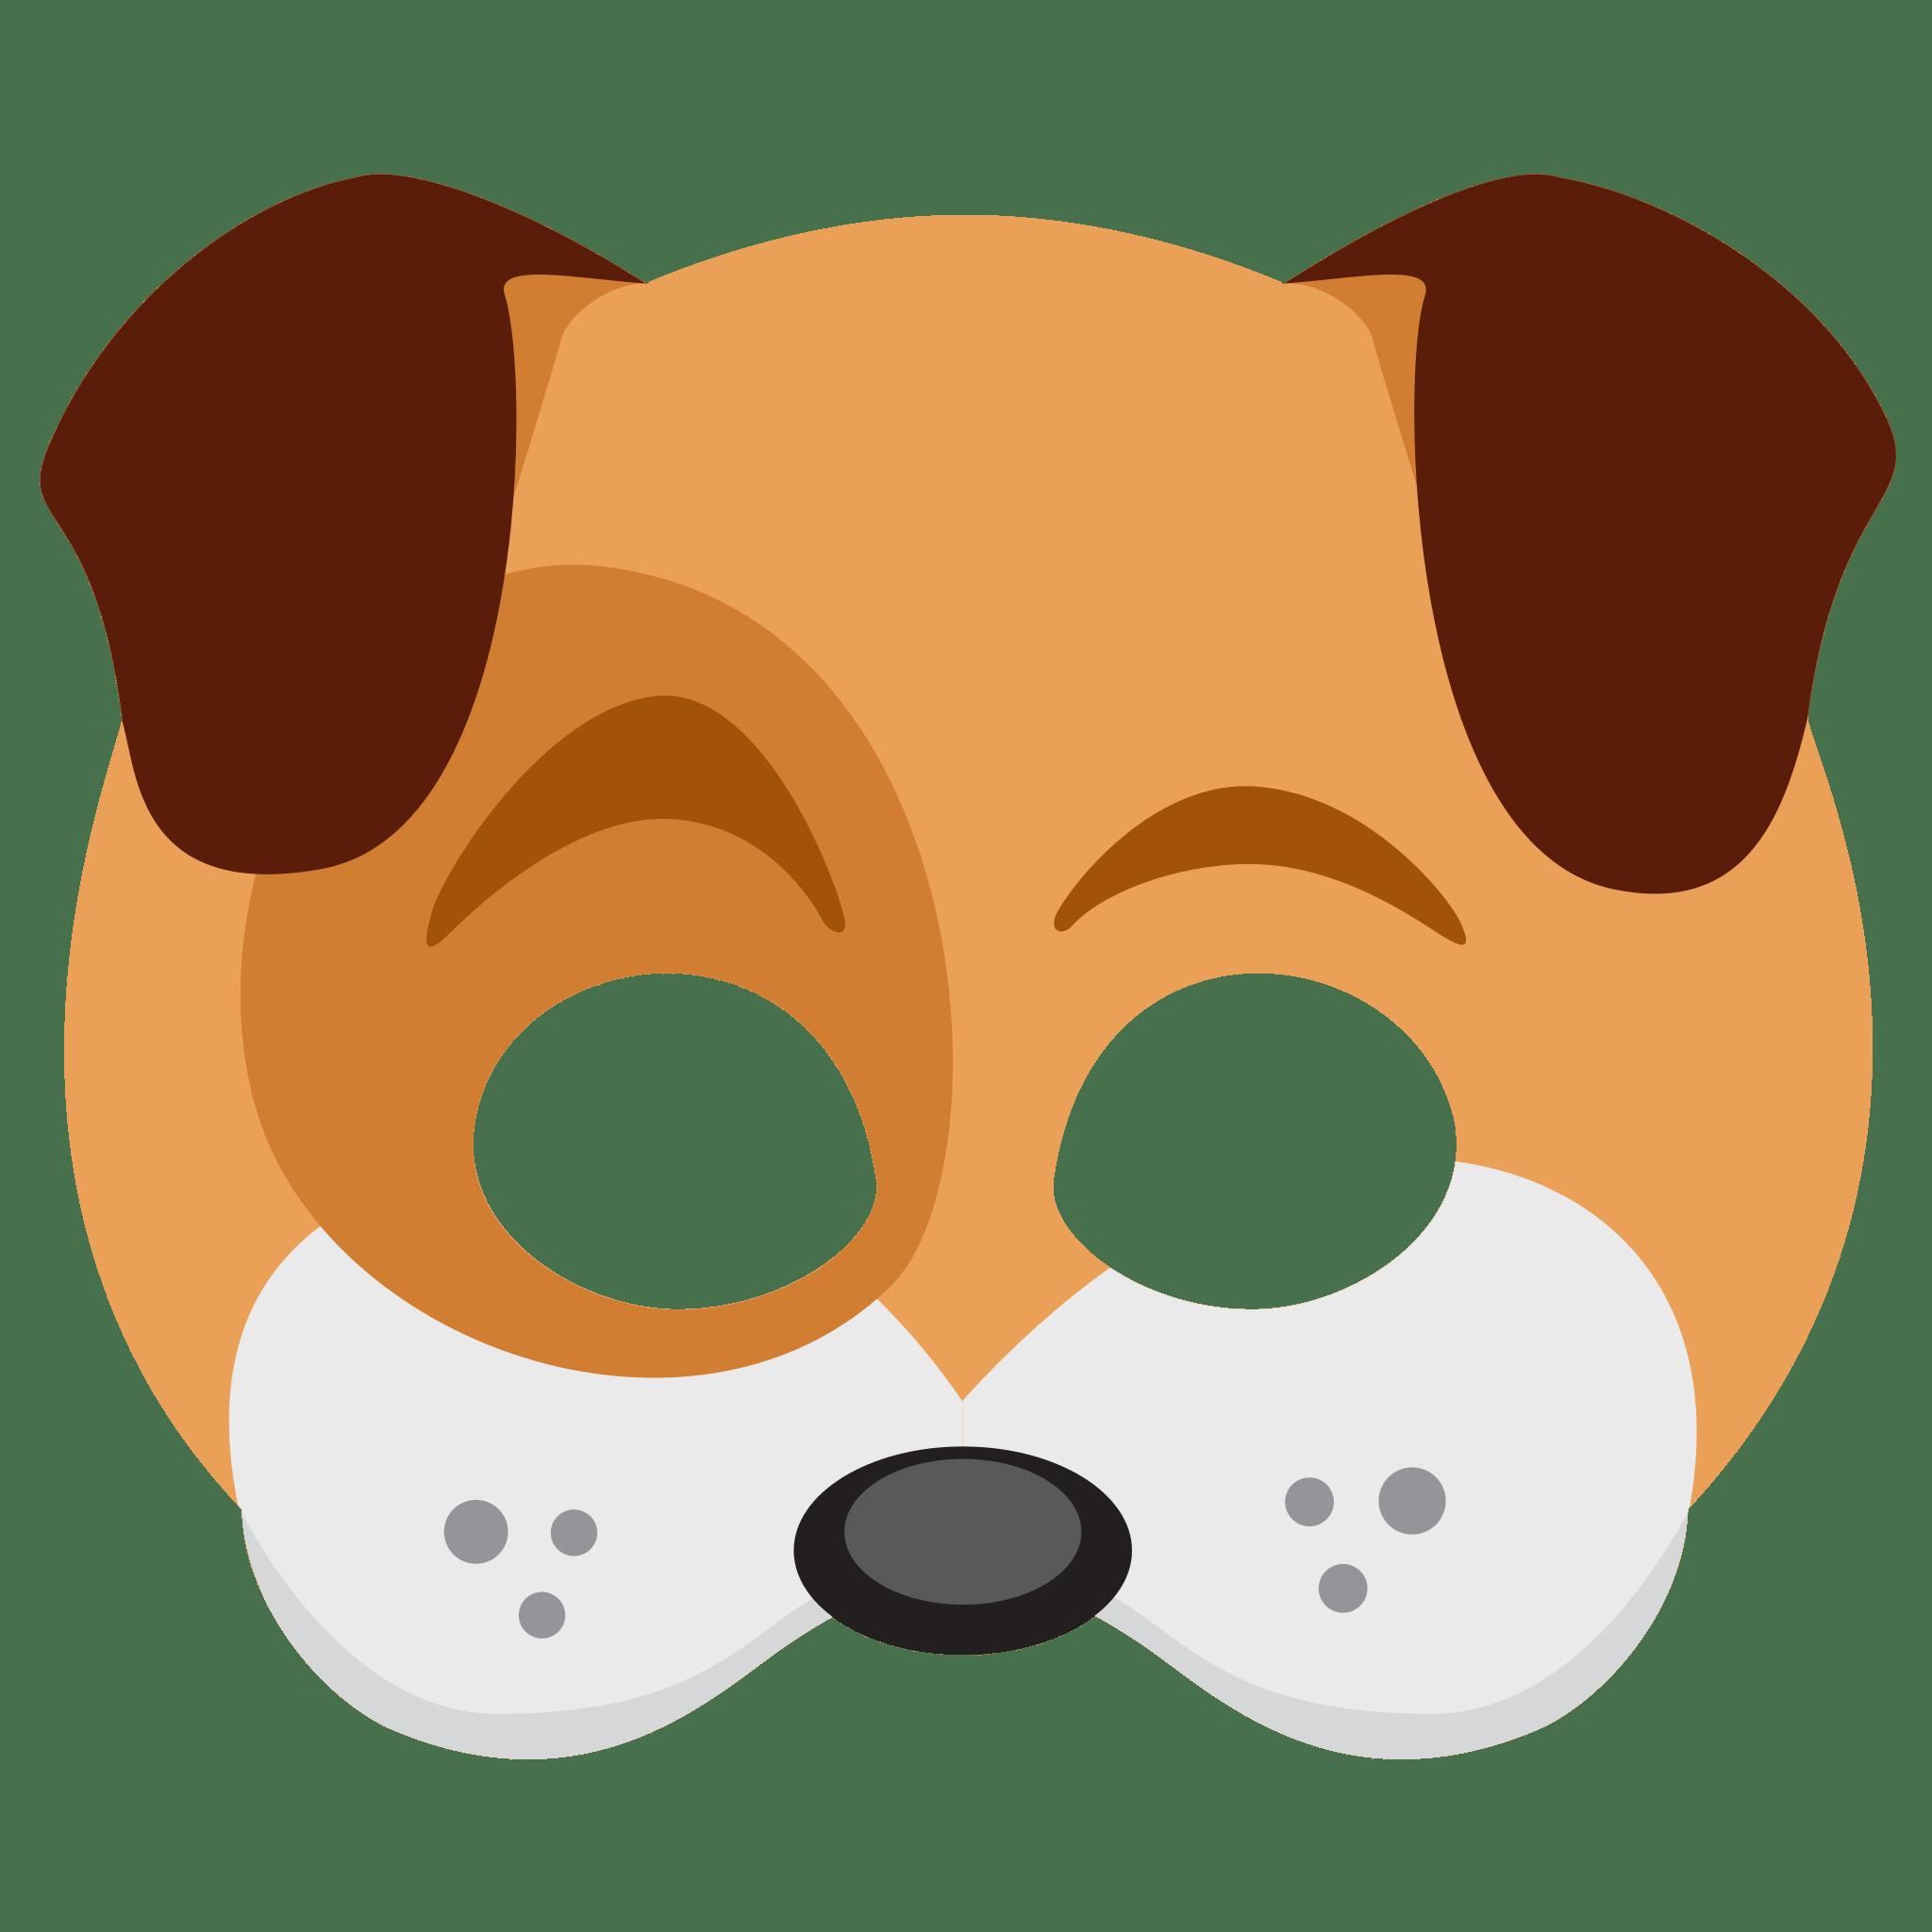 Dog ears clipart clip art download Snapchat Dog Face Sticker transparent PNG - StickPNG clip art download